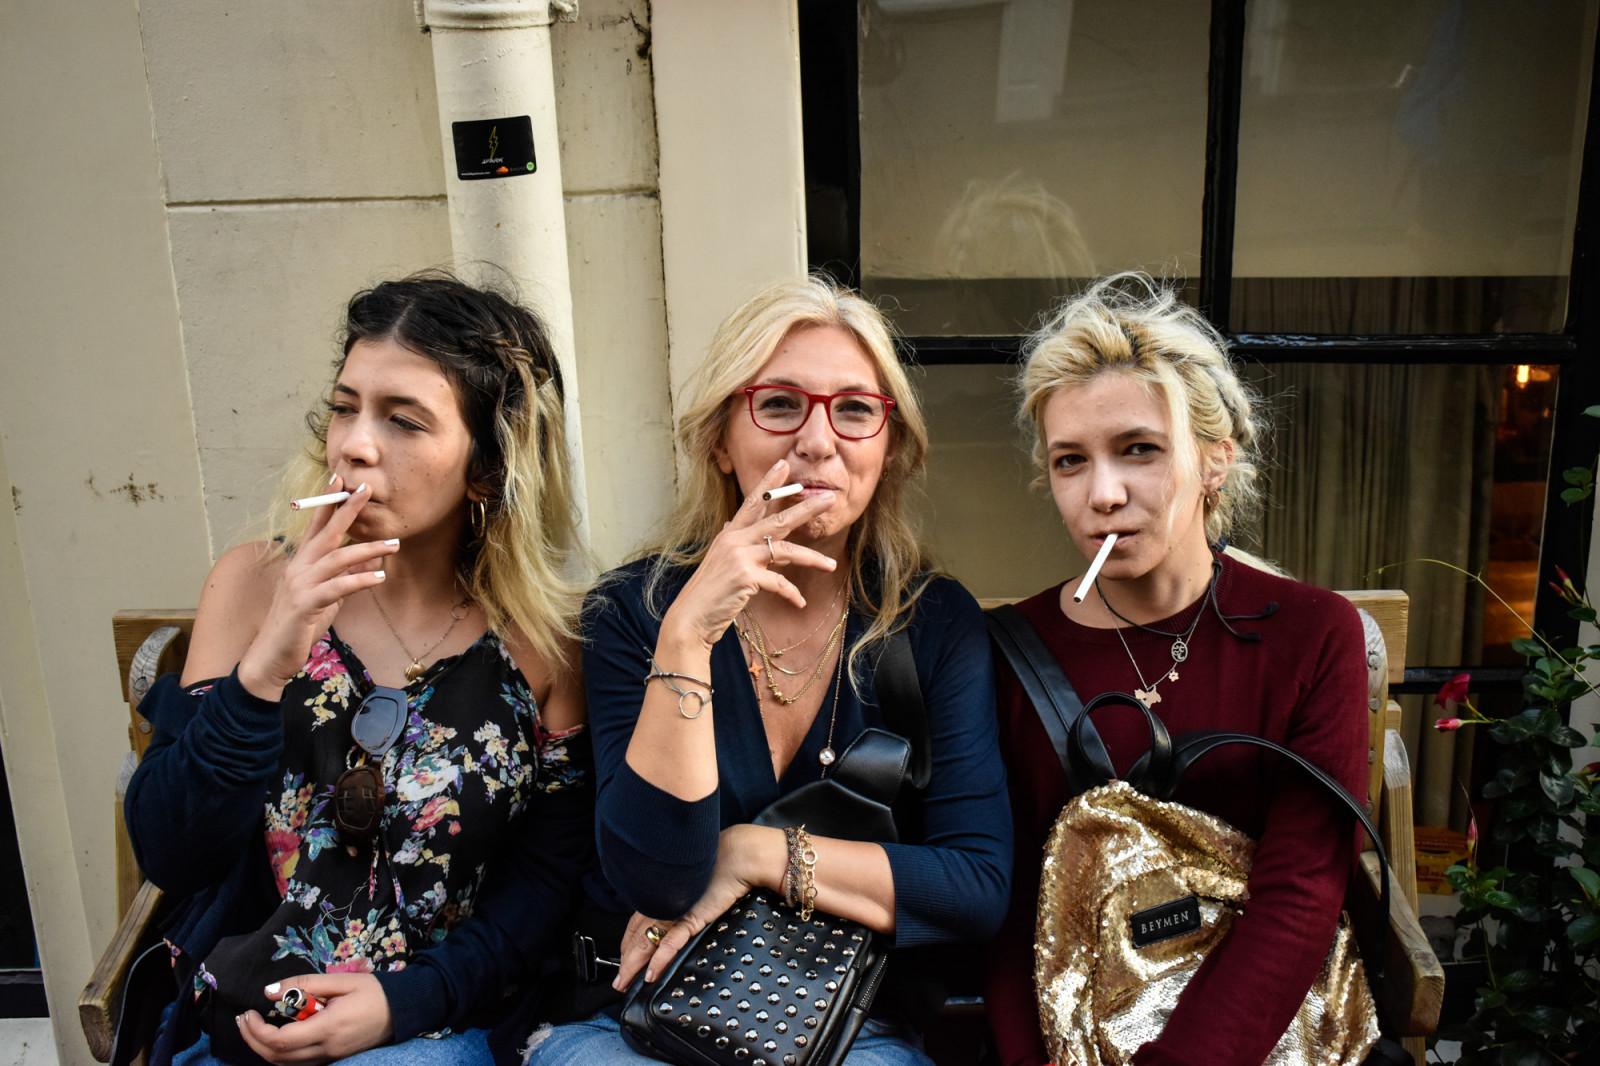 Three women smoking cigarettes in Amsterdam